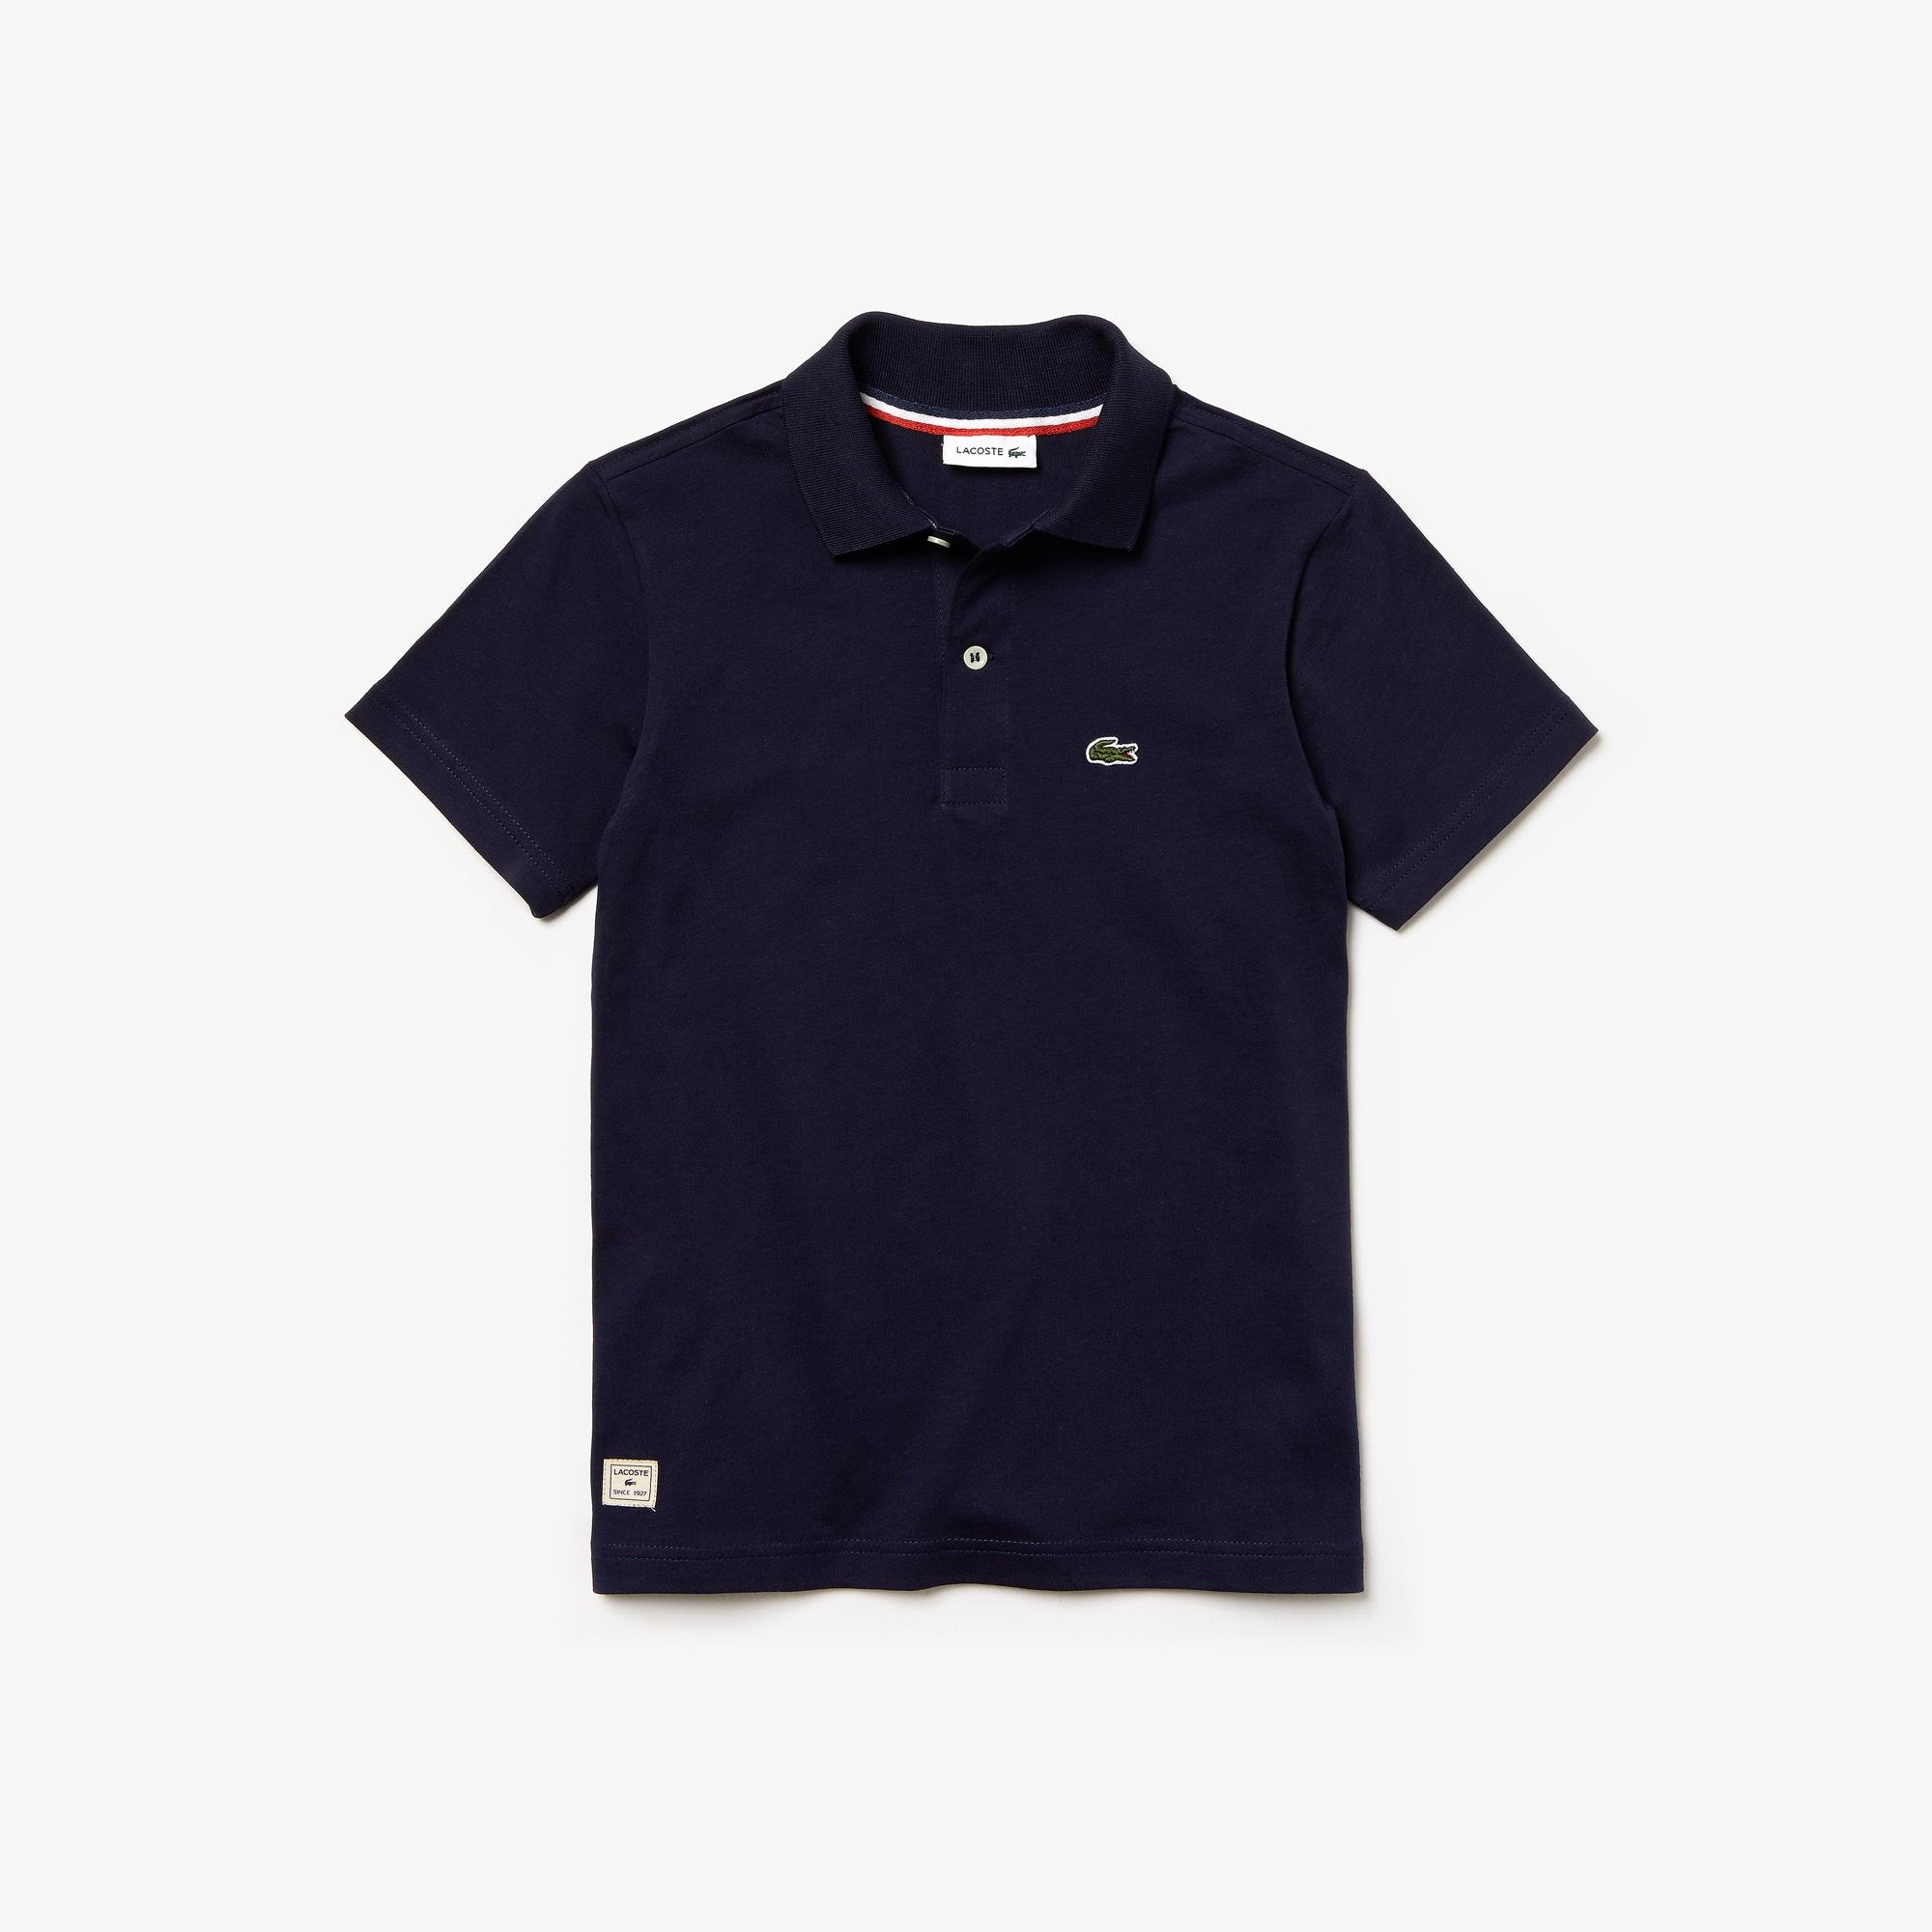 Polo Bambino Lacoste in jersey di cotone tinta unita